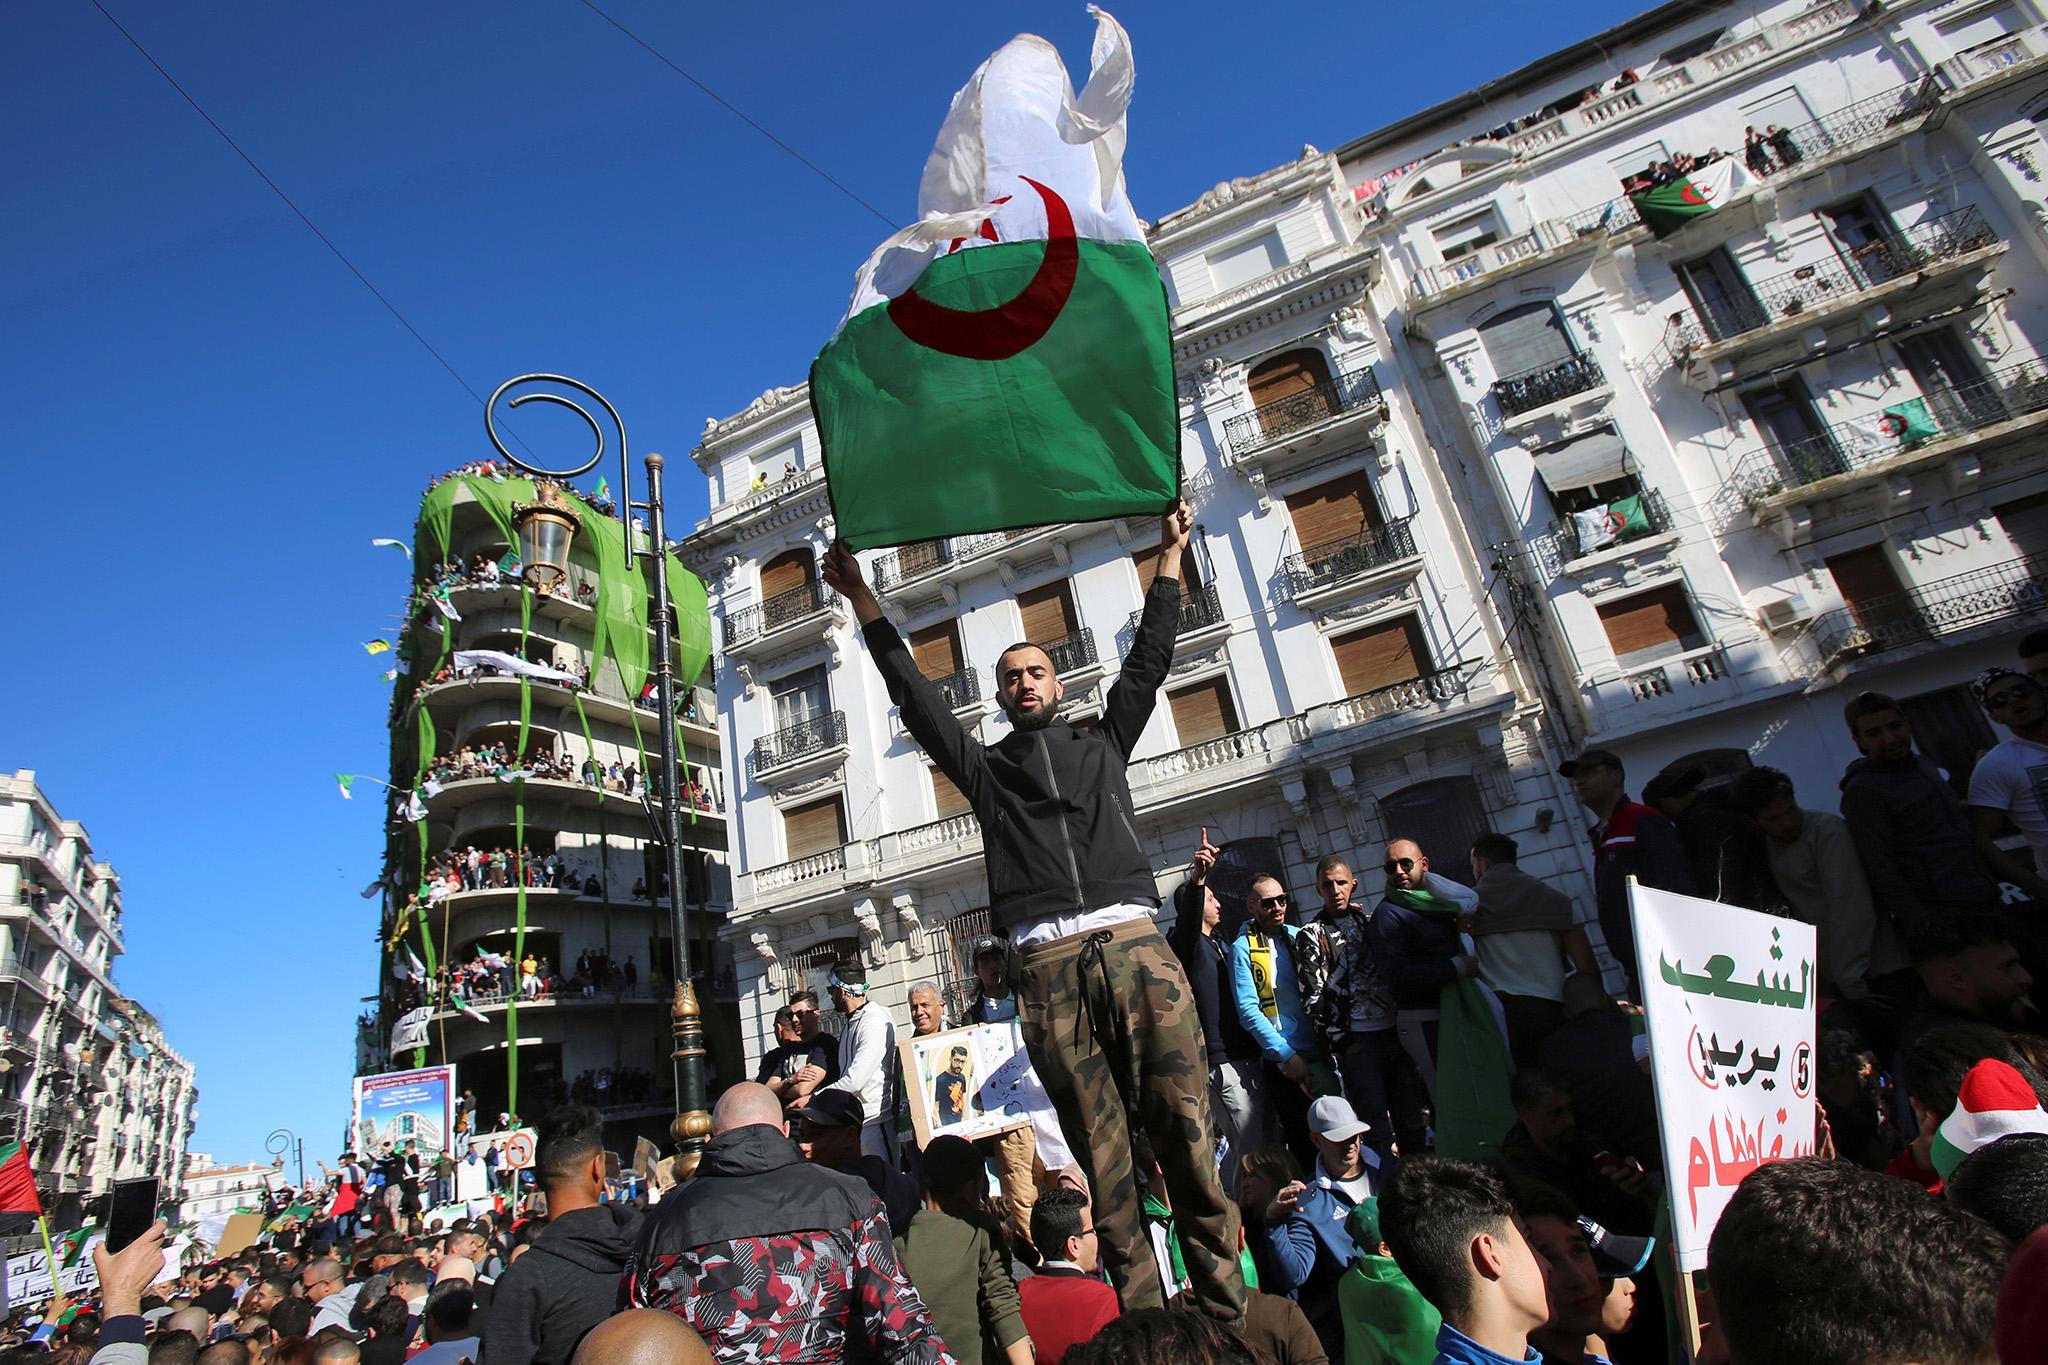 People Vs  Pouvoir: Demonstrators take on Algeria's shadowy forces